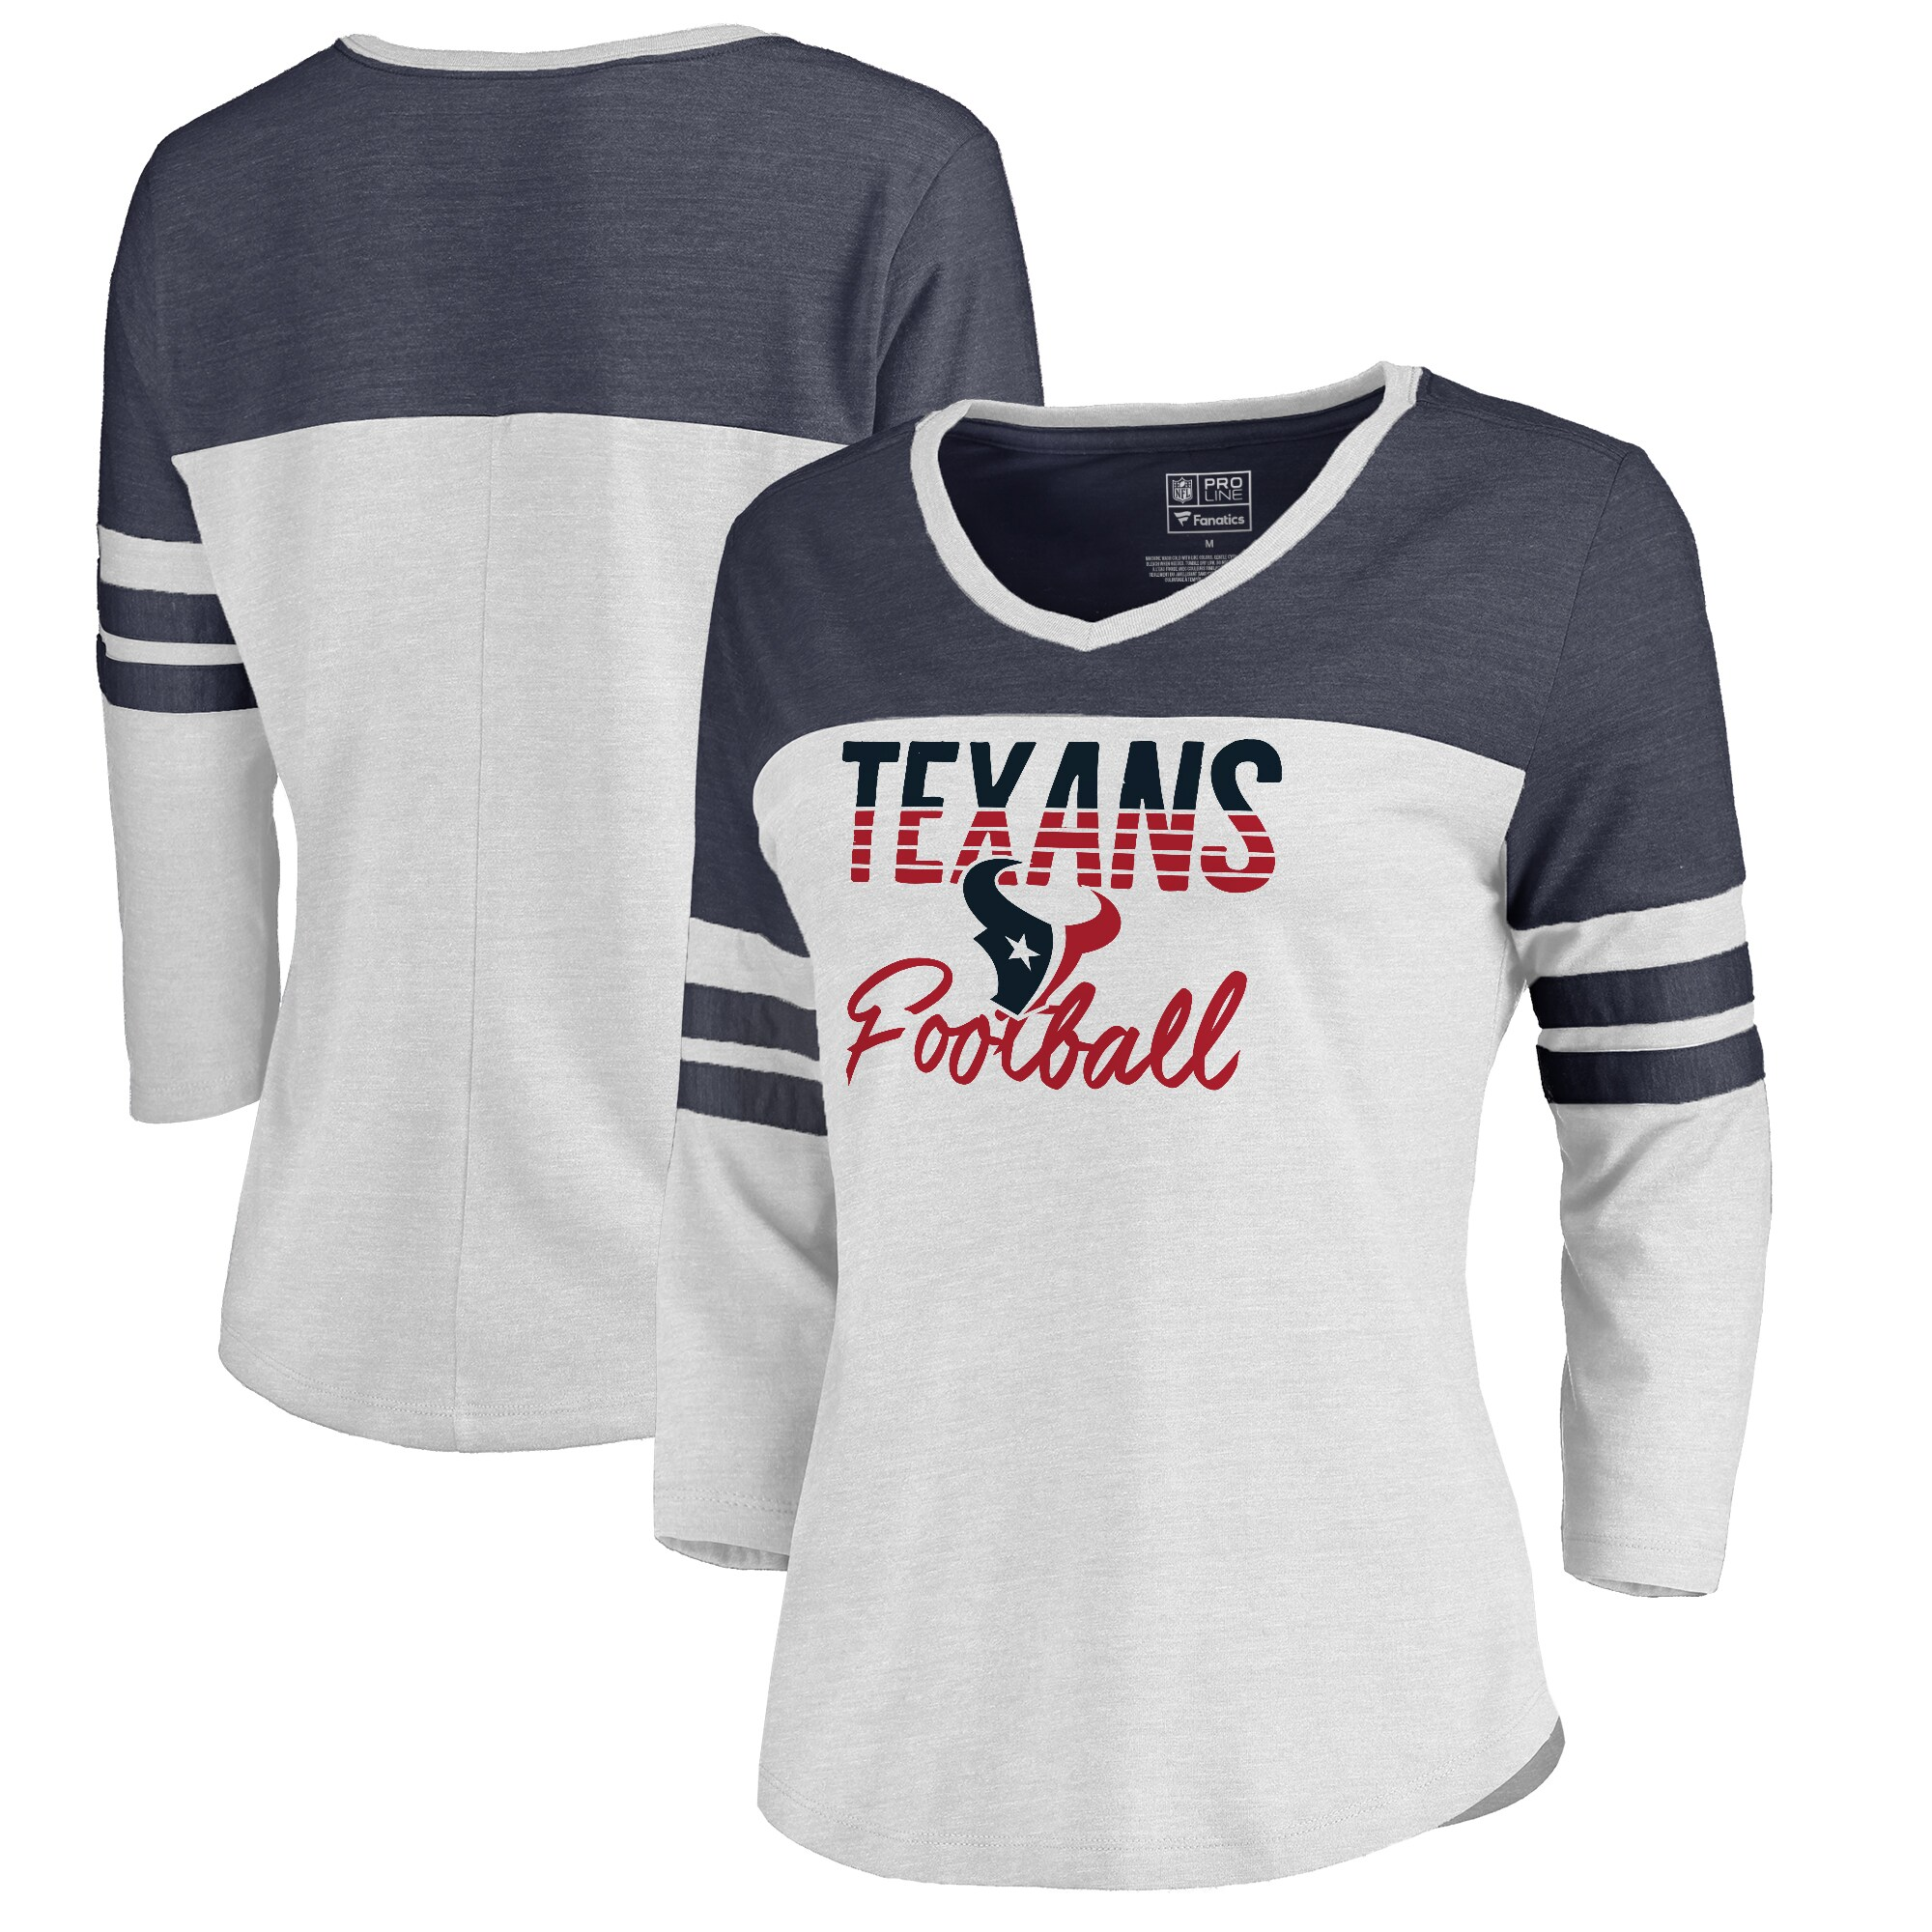 Houston Texans NFL Pro Line by Fanatics Branded Women's Plus Size Color Block 3/4 Sleeve Tri-Blend T-Shirt - White